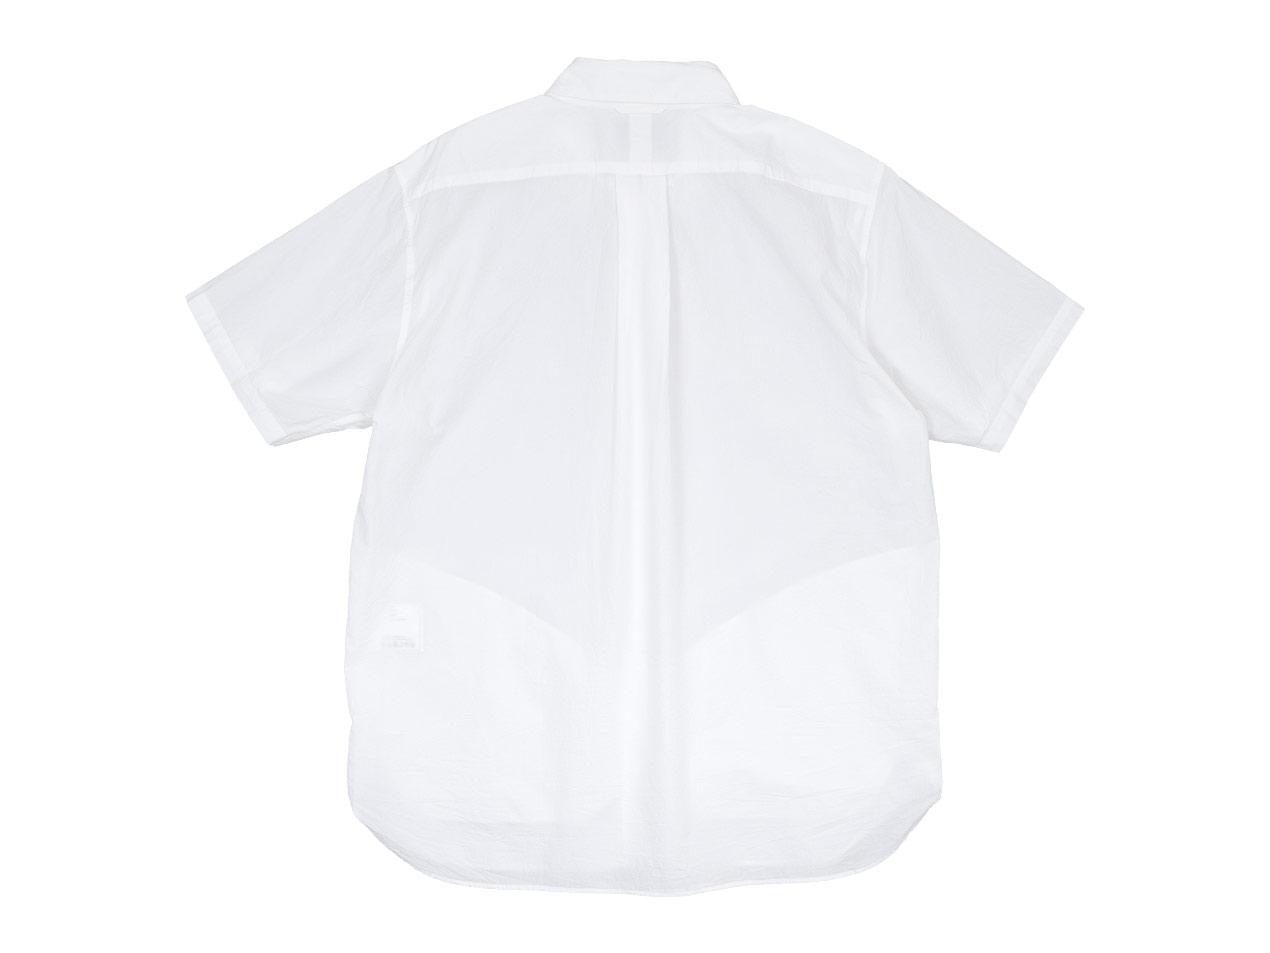 YAECA コンフォートシャツ リラックスロング 半袖〔メンズ〕